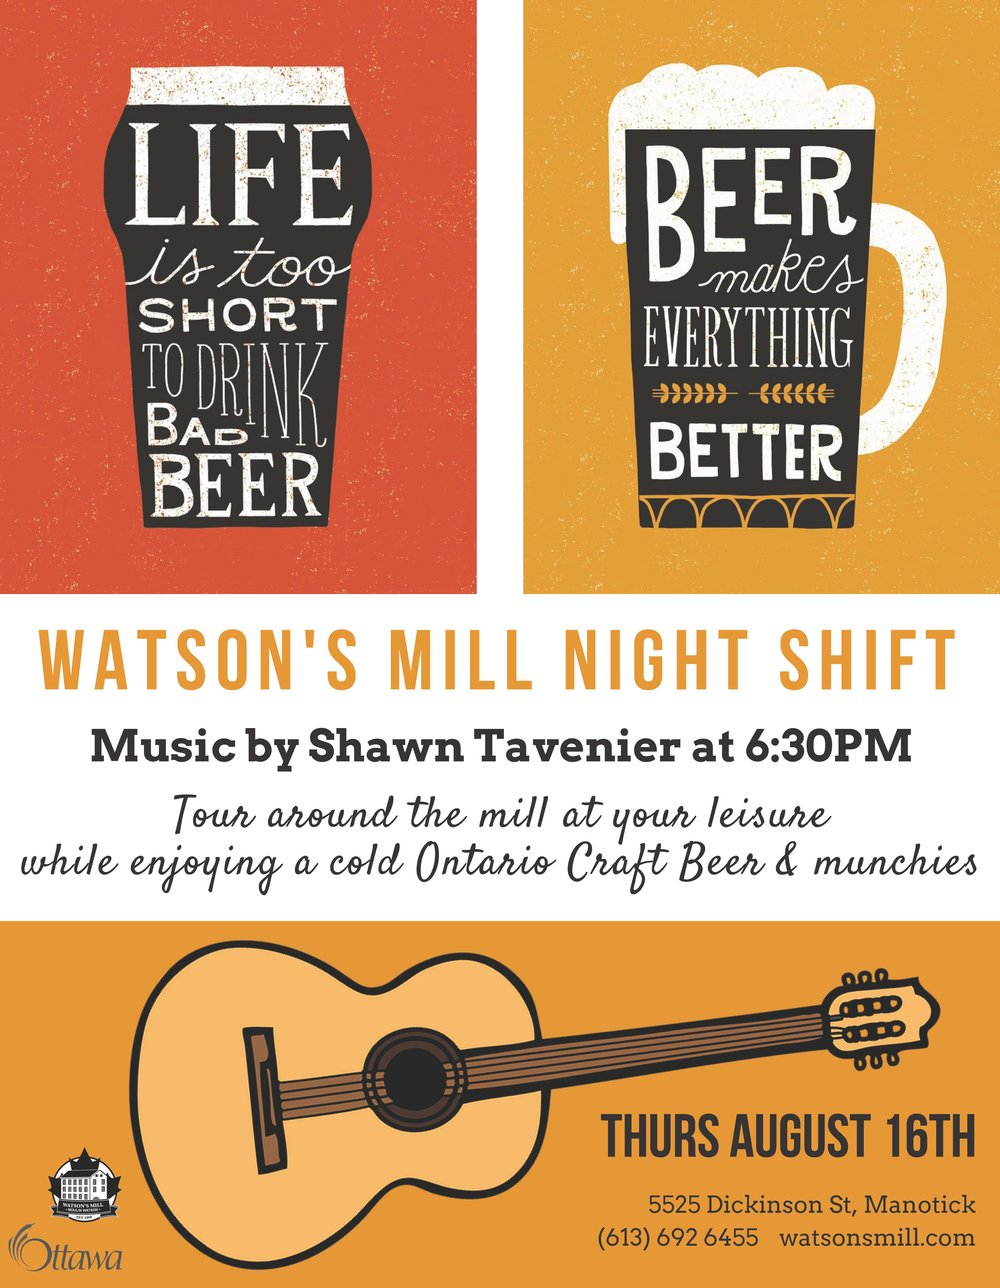 Watson's Mill Night Shift Beer.jpg